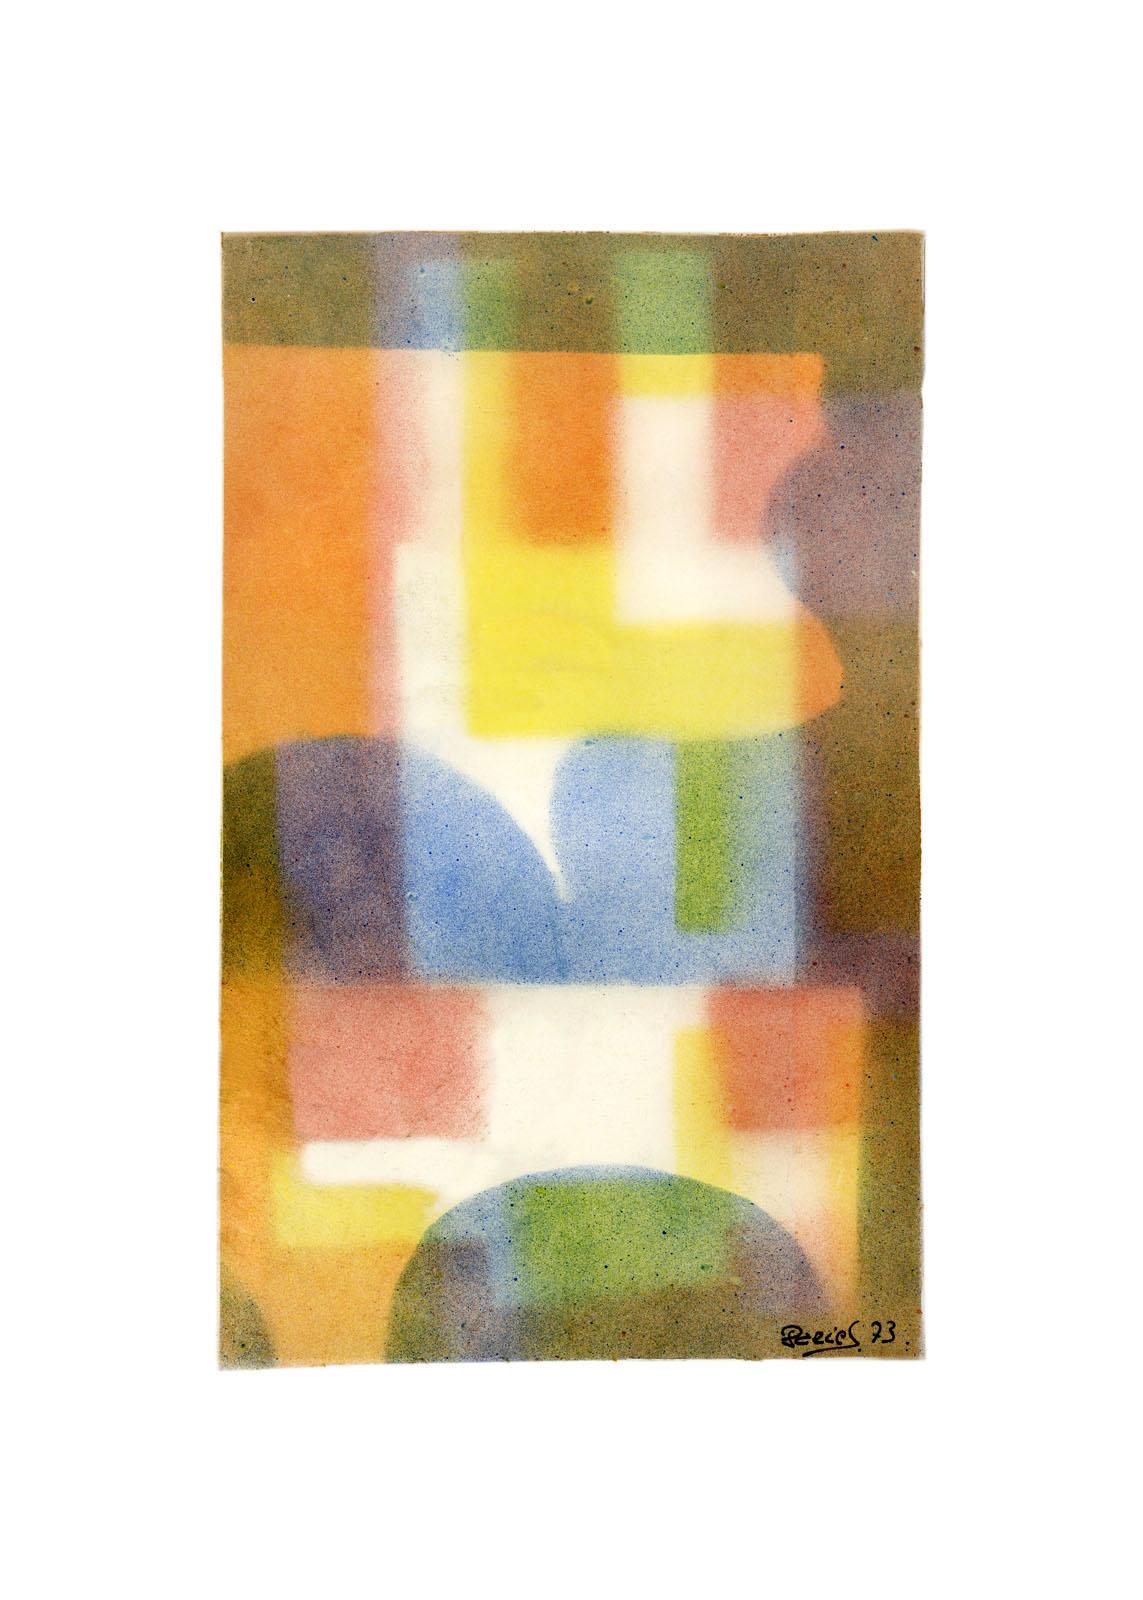 panies-danielvillalobos-spanish-painting-abstract-16